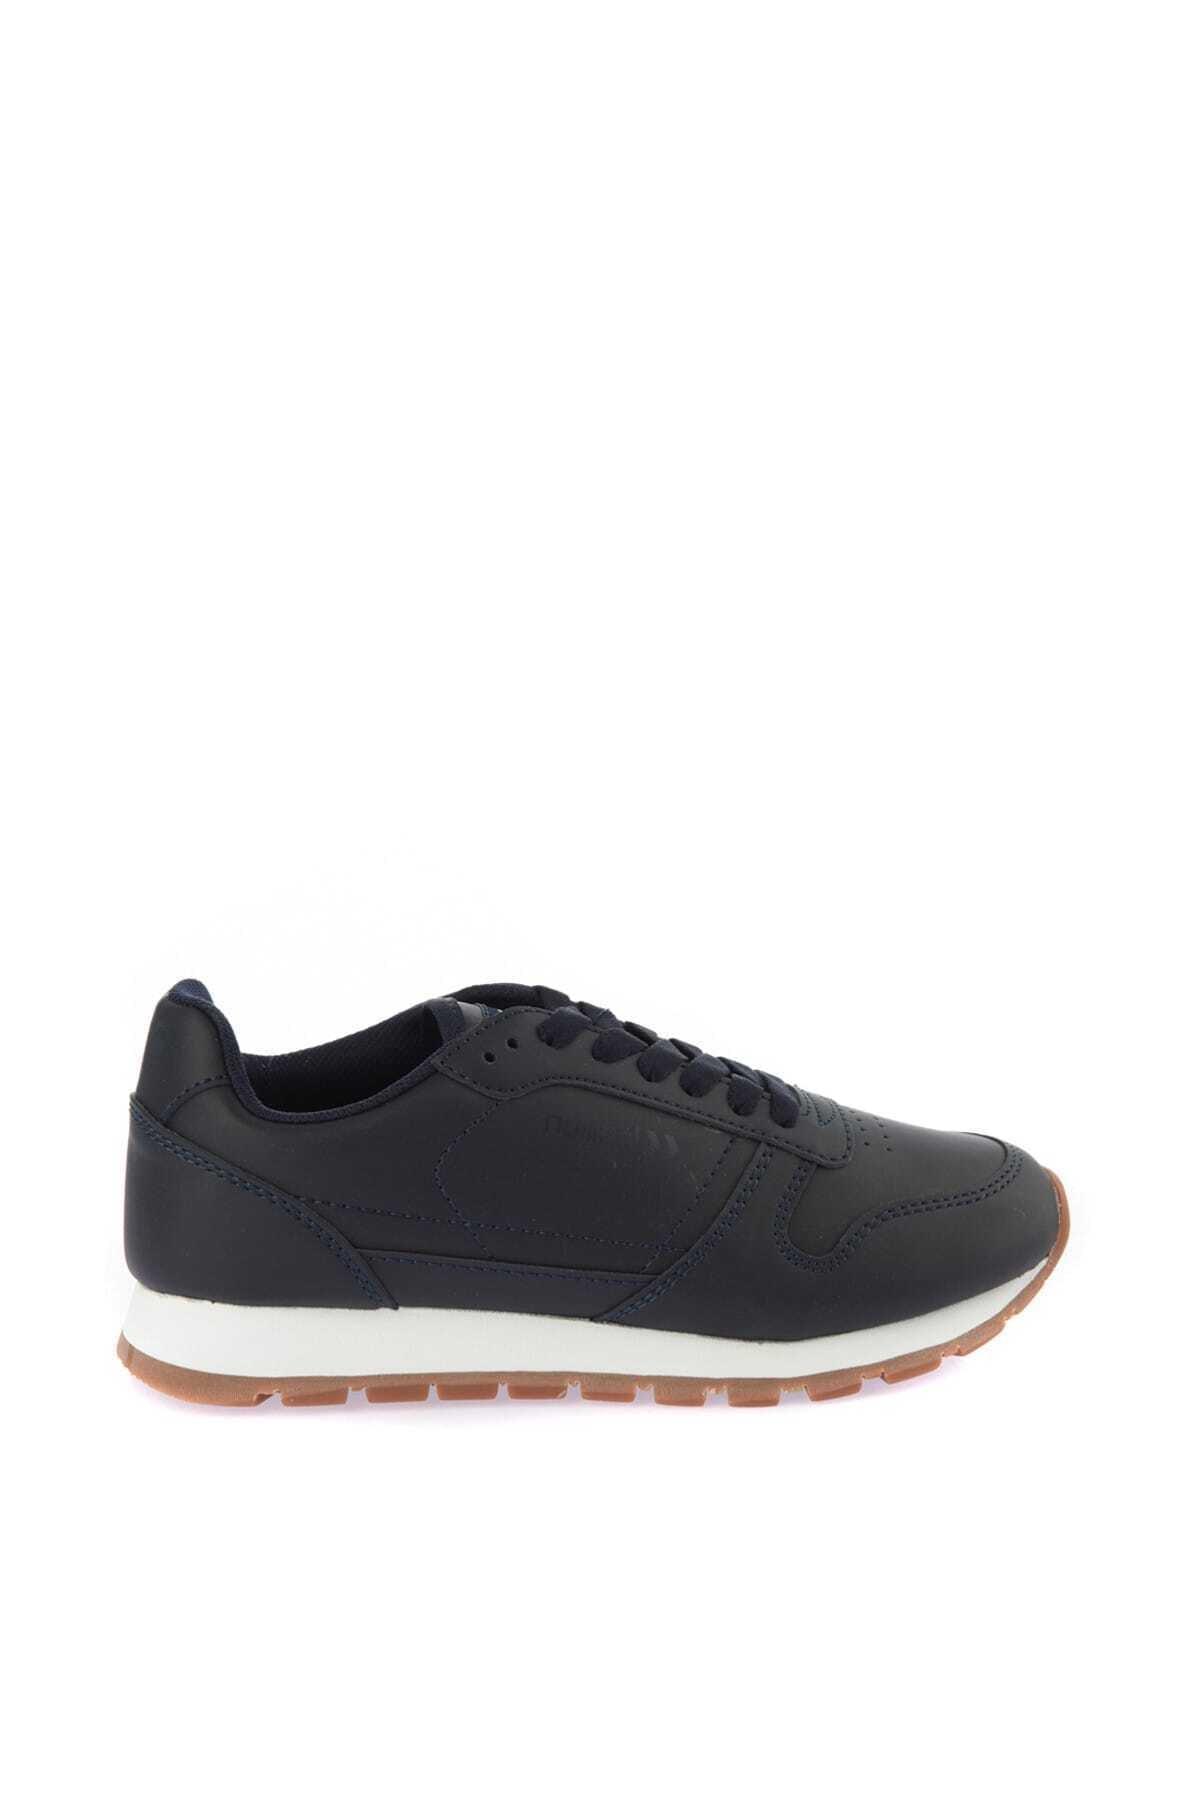 HUMMEL Street Lacivert Erkek Sneaker Ayakkabı 100352288 2